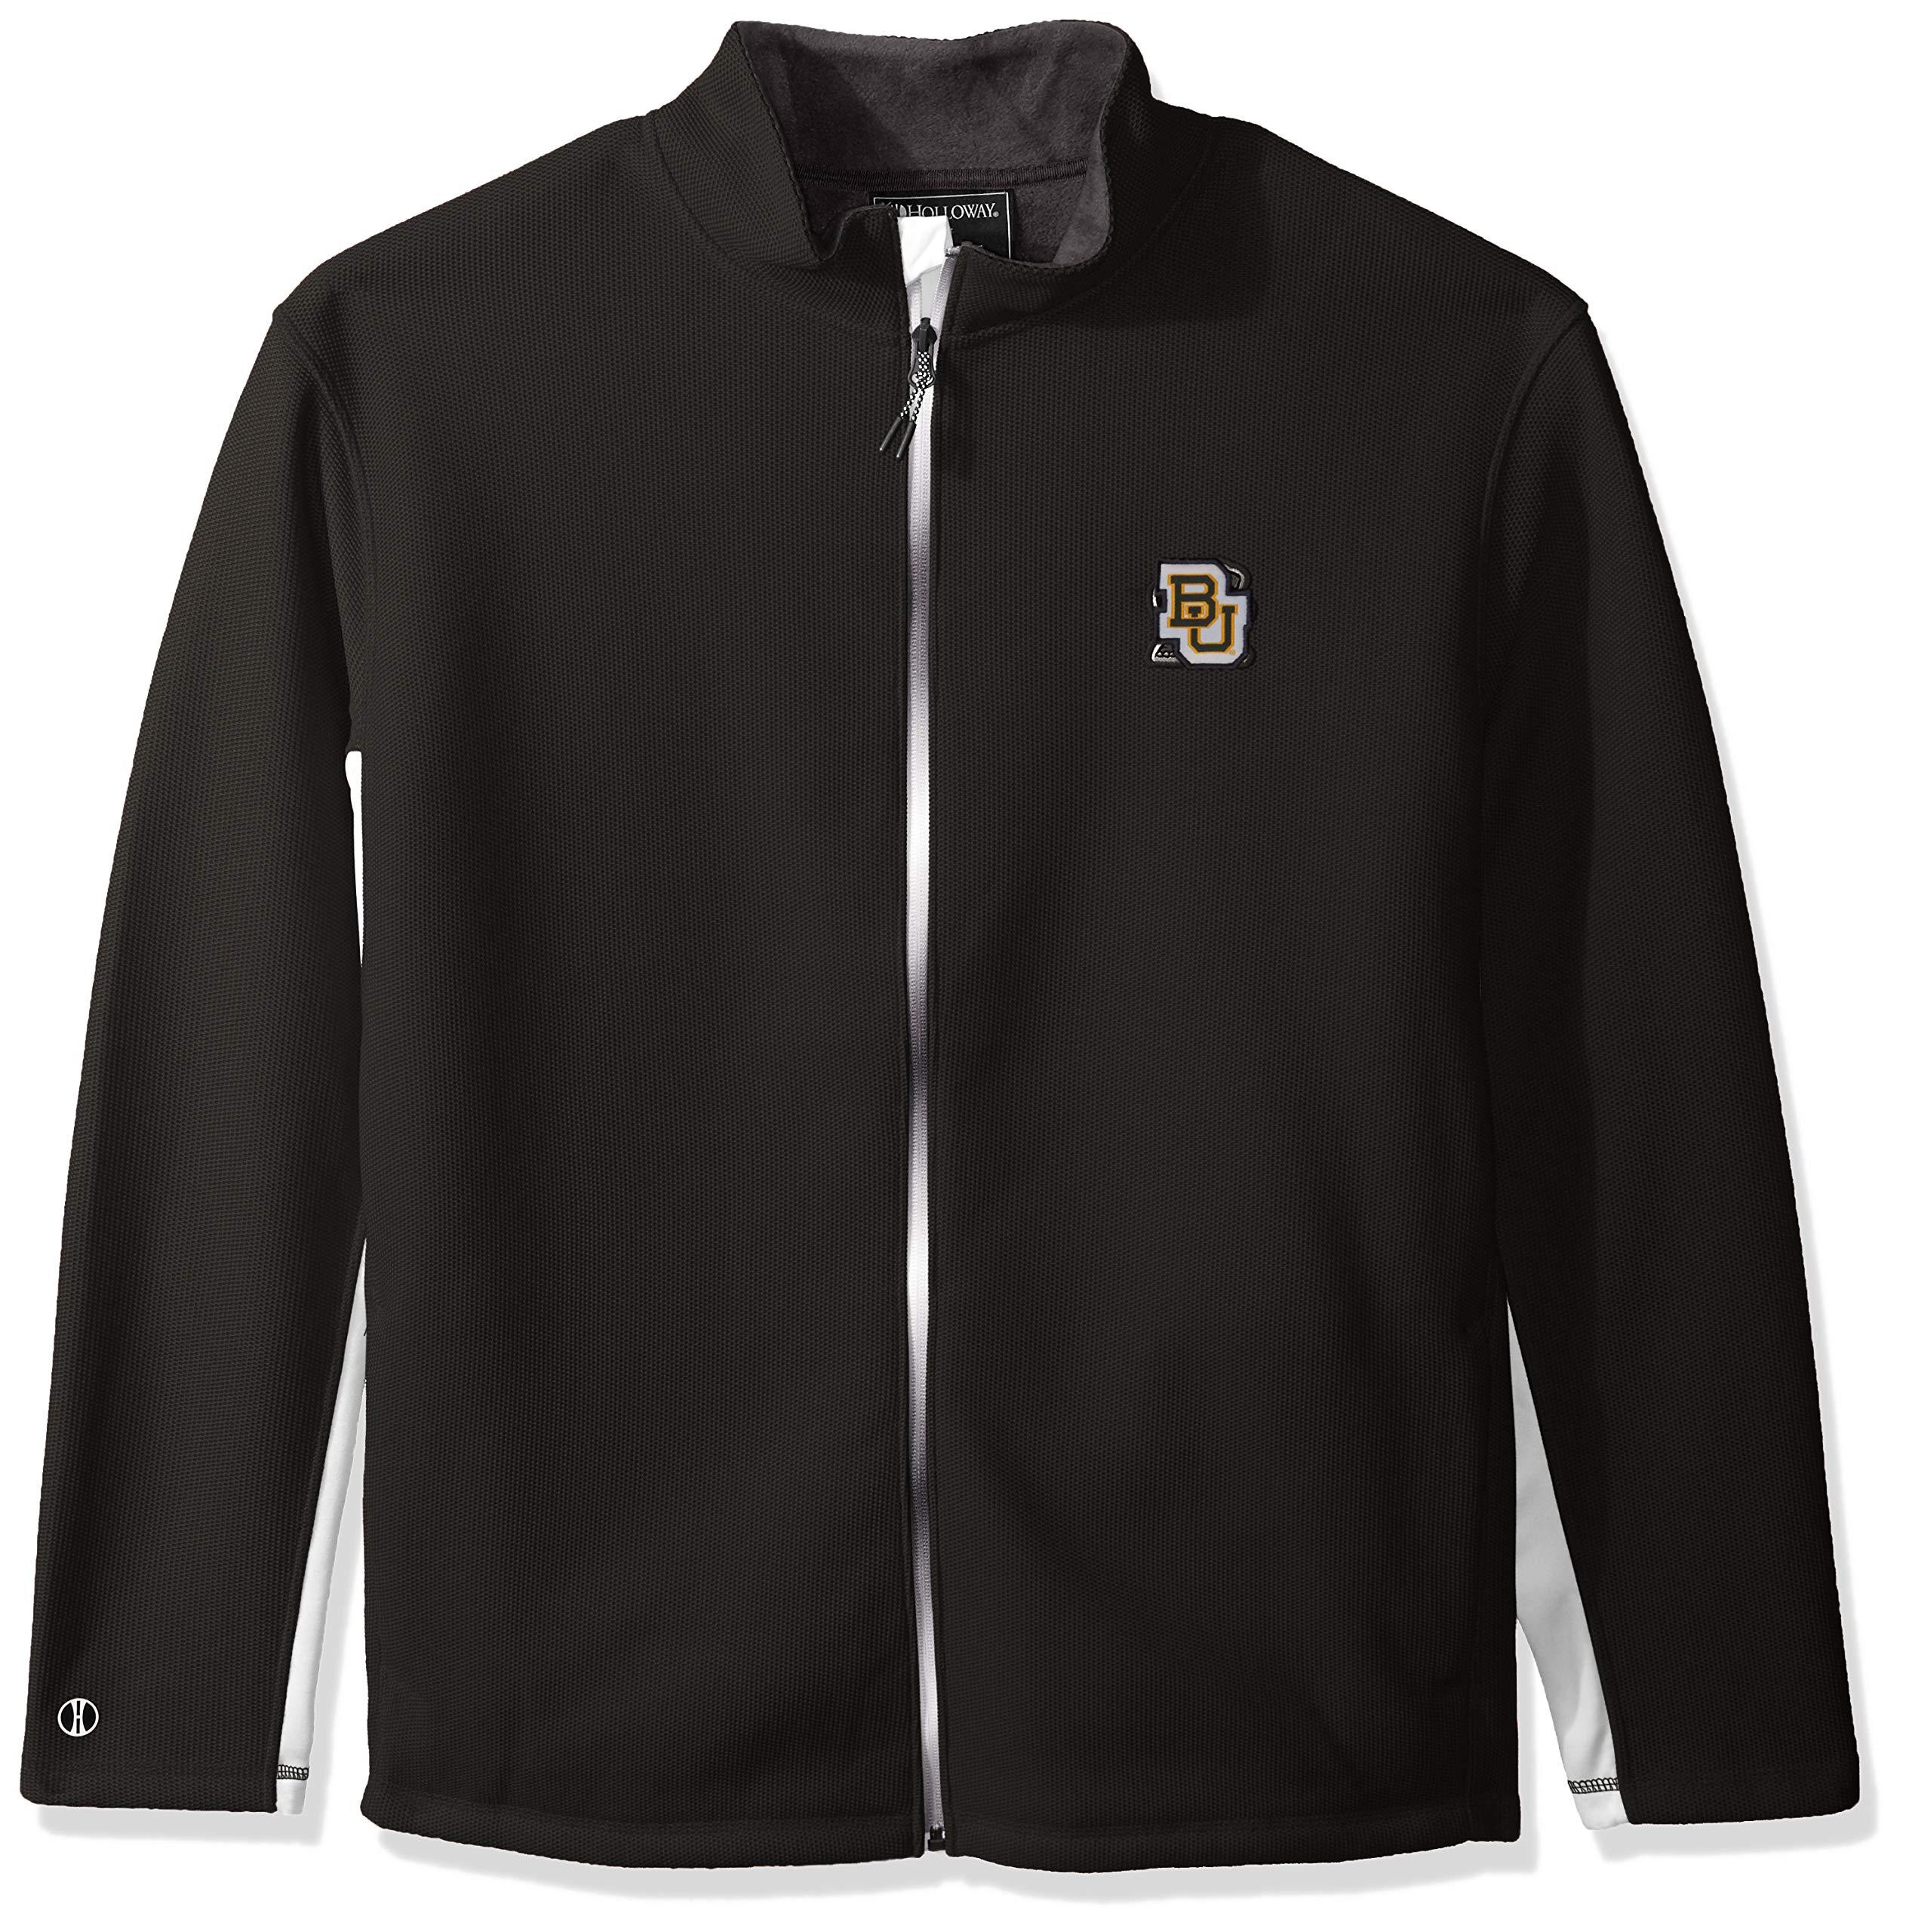 Ouray Sportswear NCAA Baylor Bears Men's Invert Jacket, Carbon/White, XX-Large